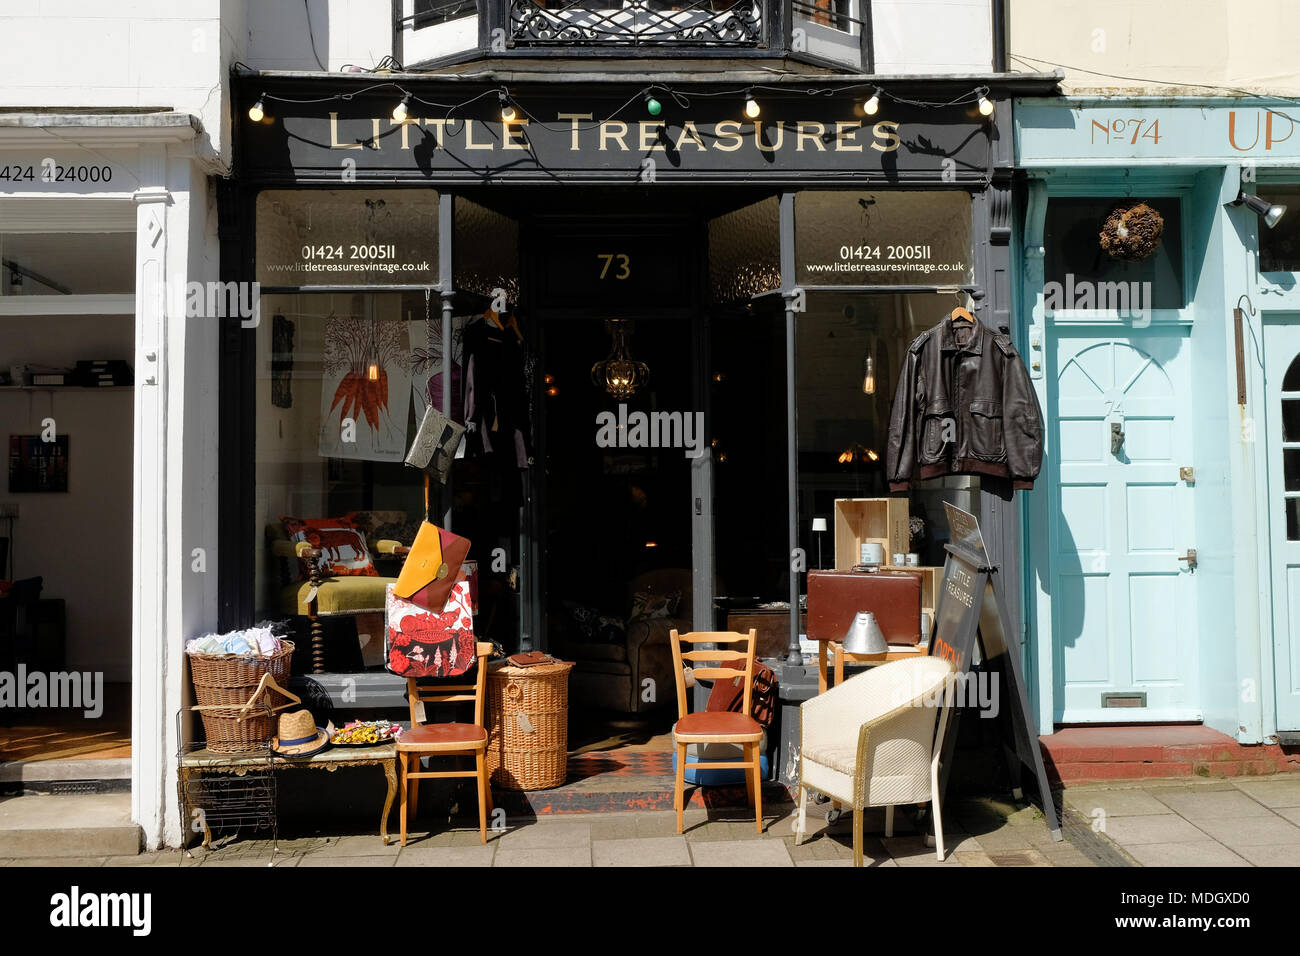 Little Treasures shop, vintage shop, hastings, east sussex, uk - Stock Image